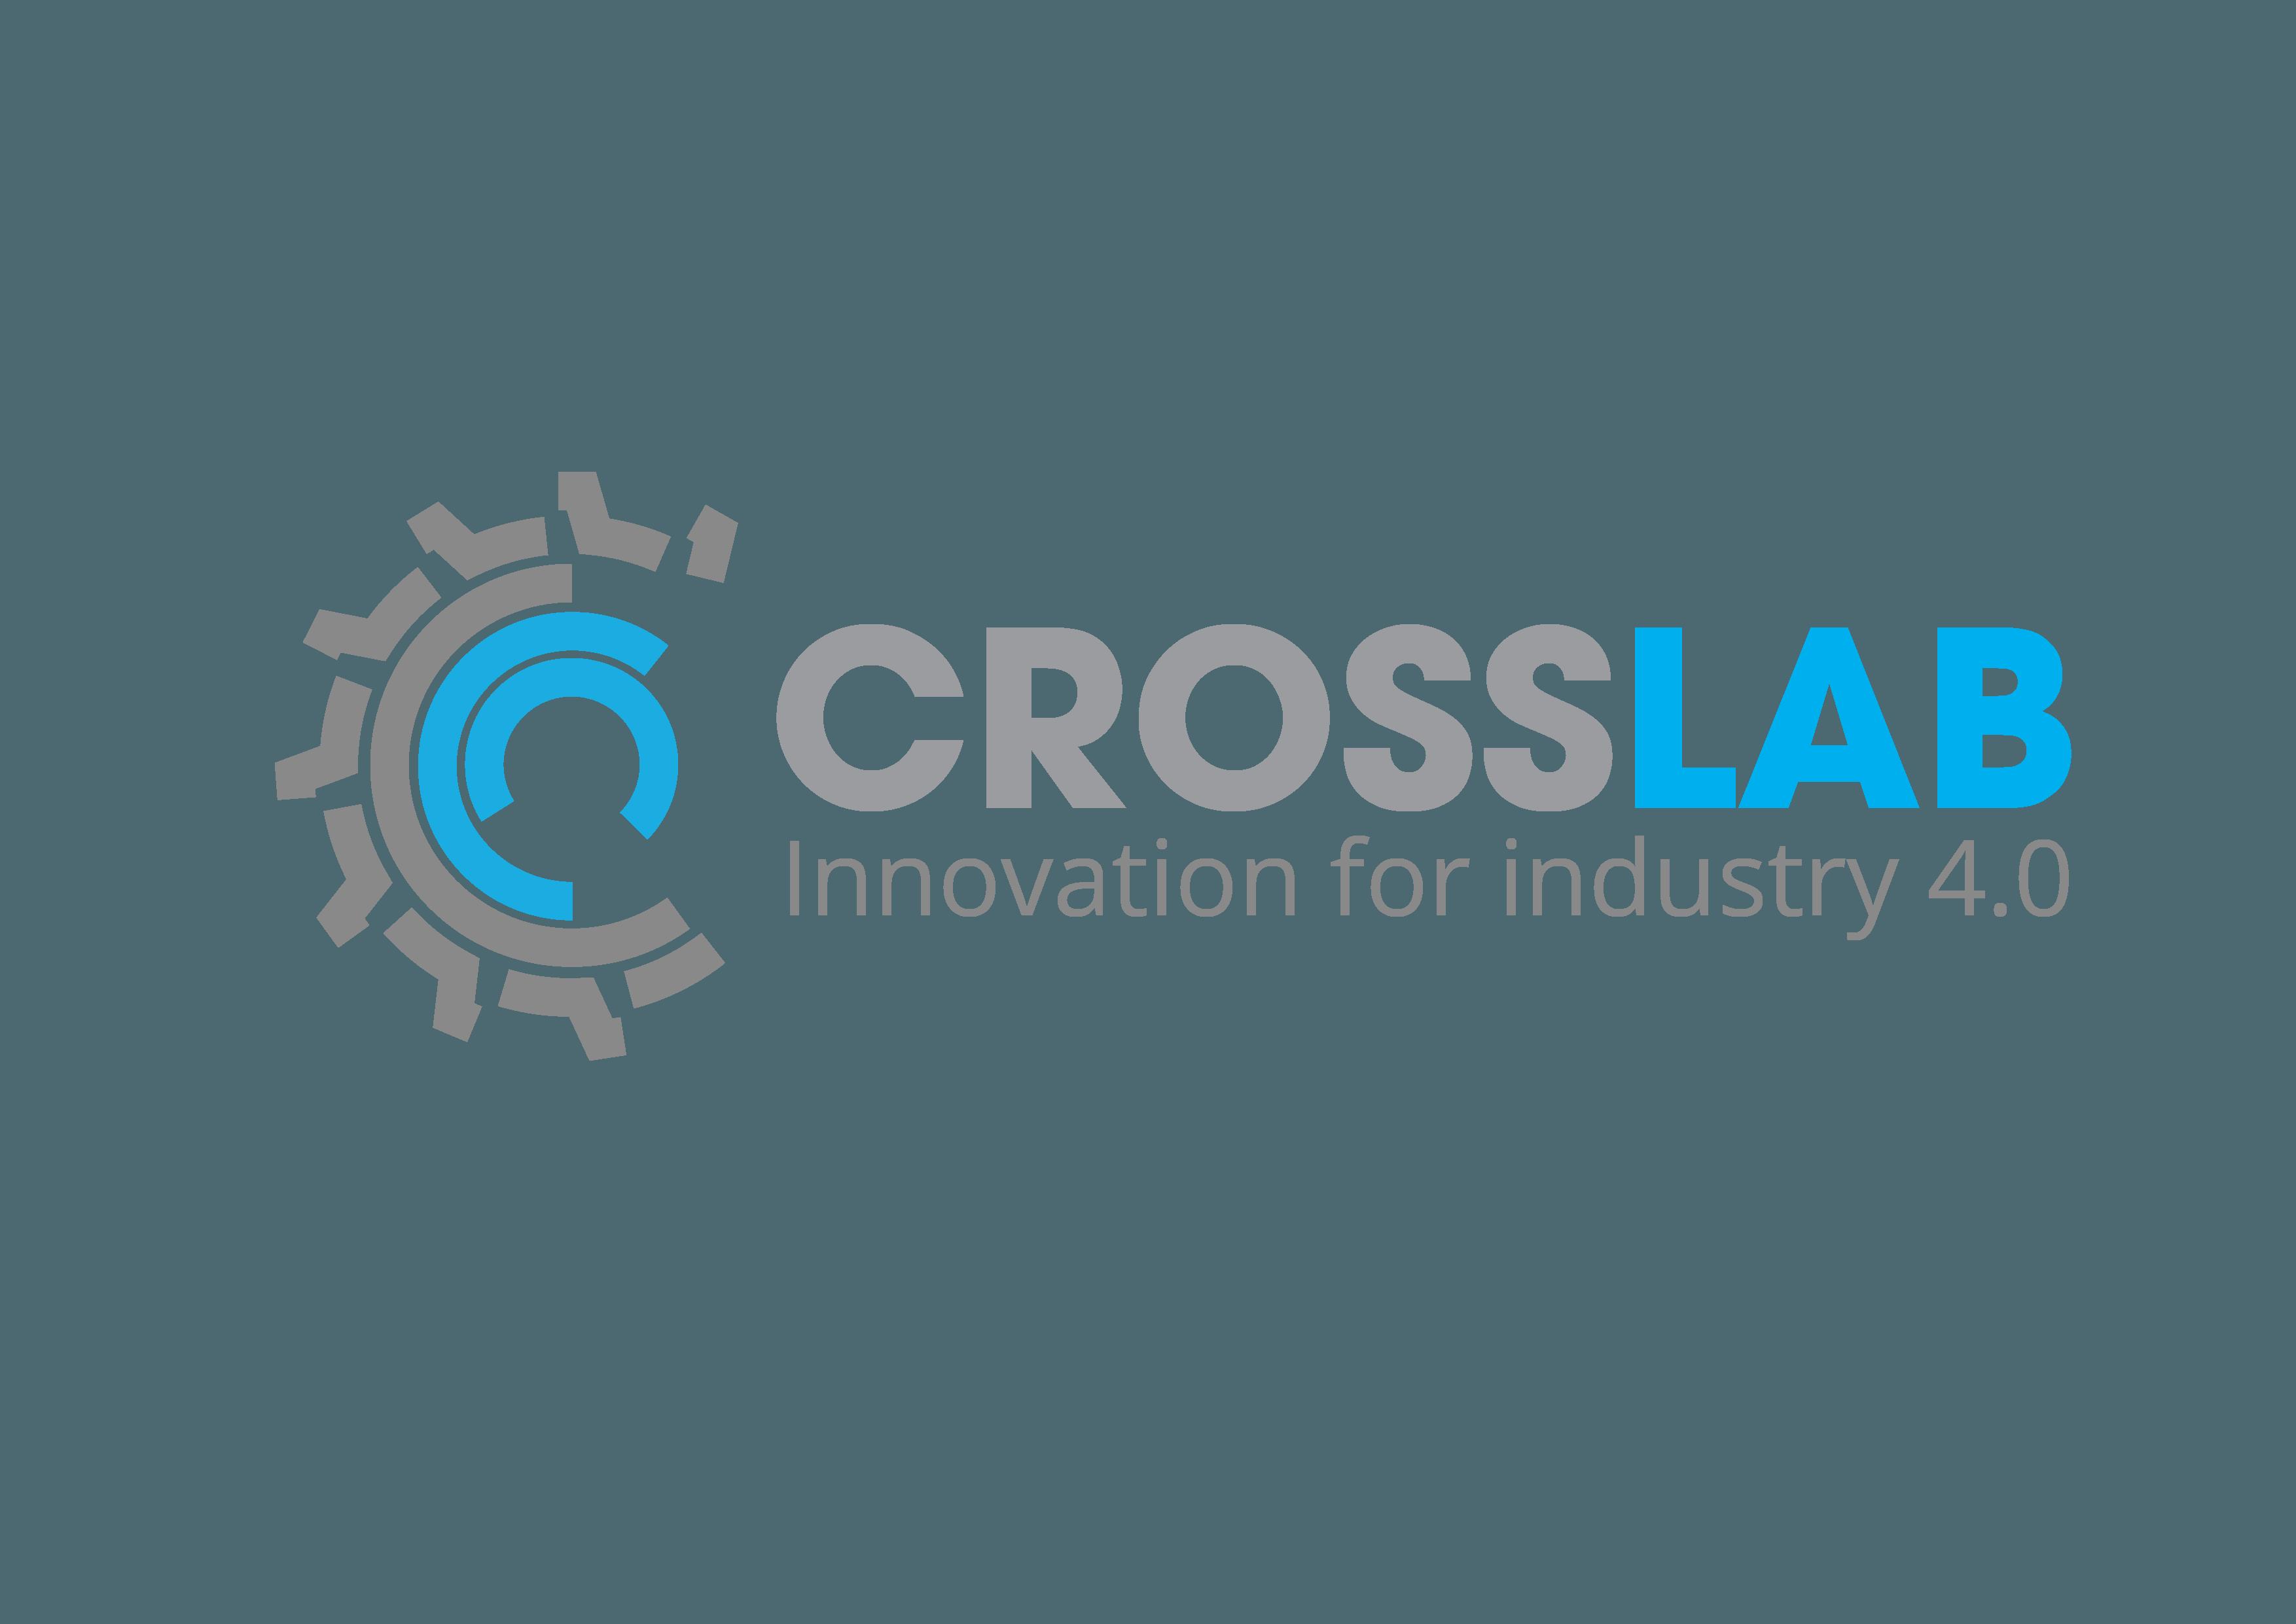 crosslab-logo.png